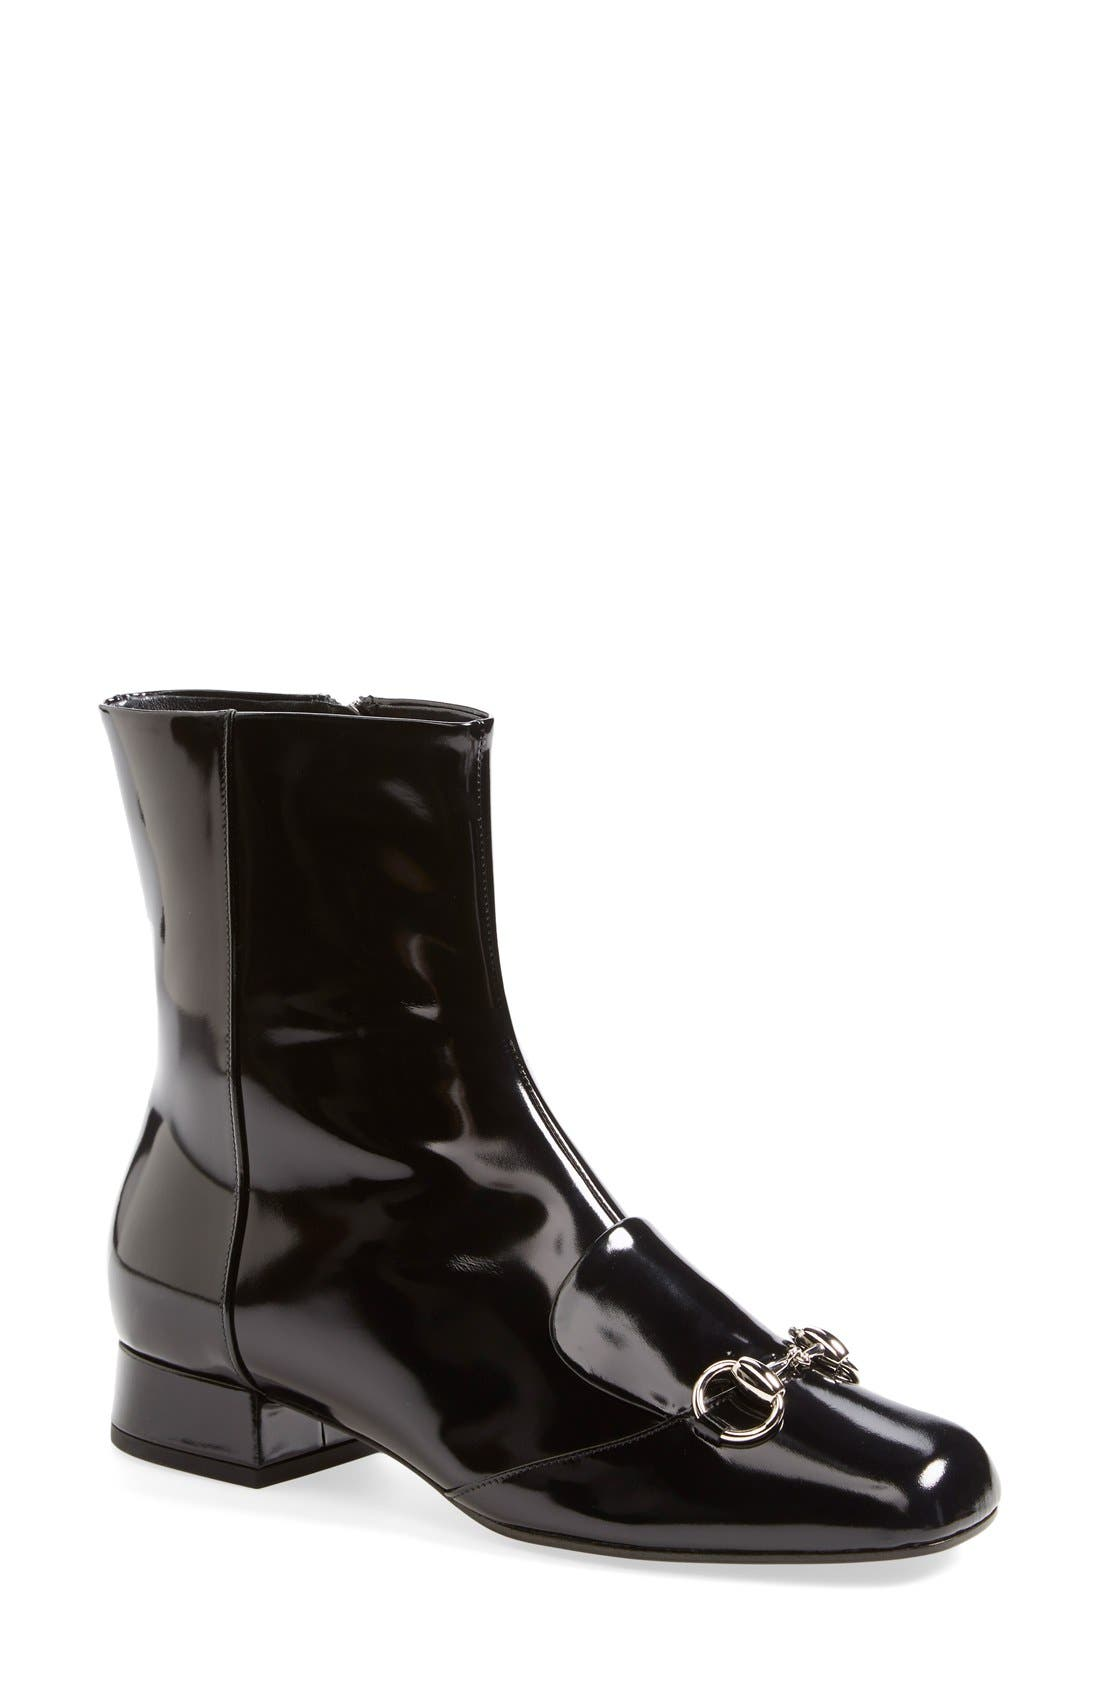 Main Image - Gucci 'Lillian' Horsebit Ankle Bootie (Women)